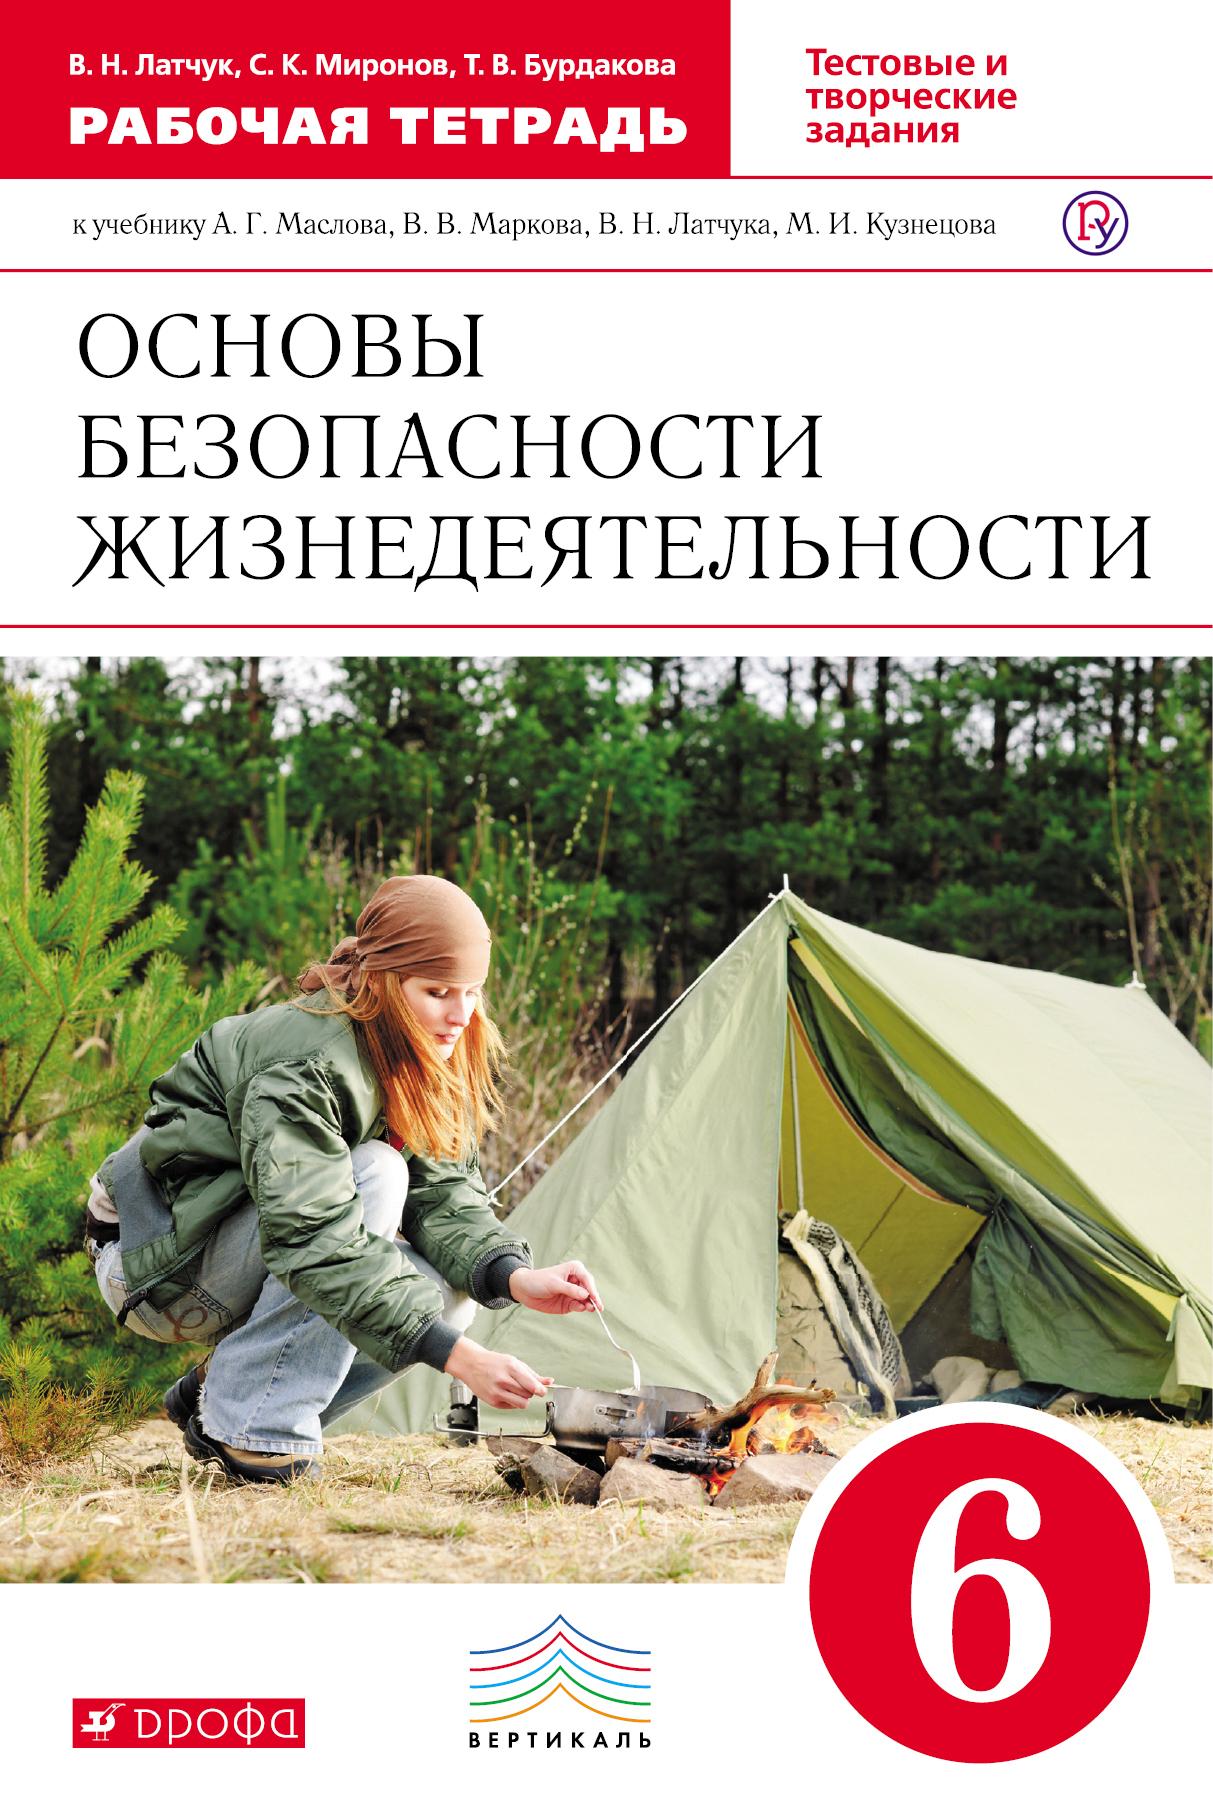 ОБЖ. 6кл Раб.тетрадь.(Миронов) ВЕРТИКАЛЬ